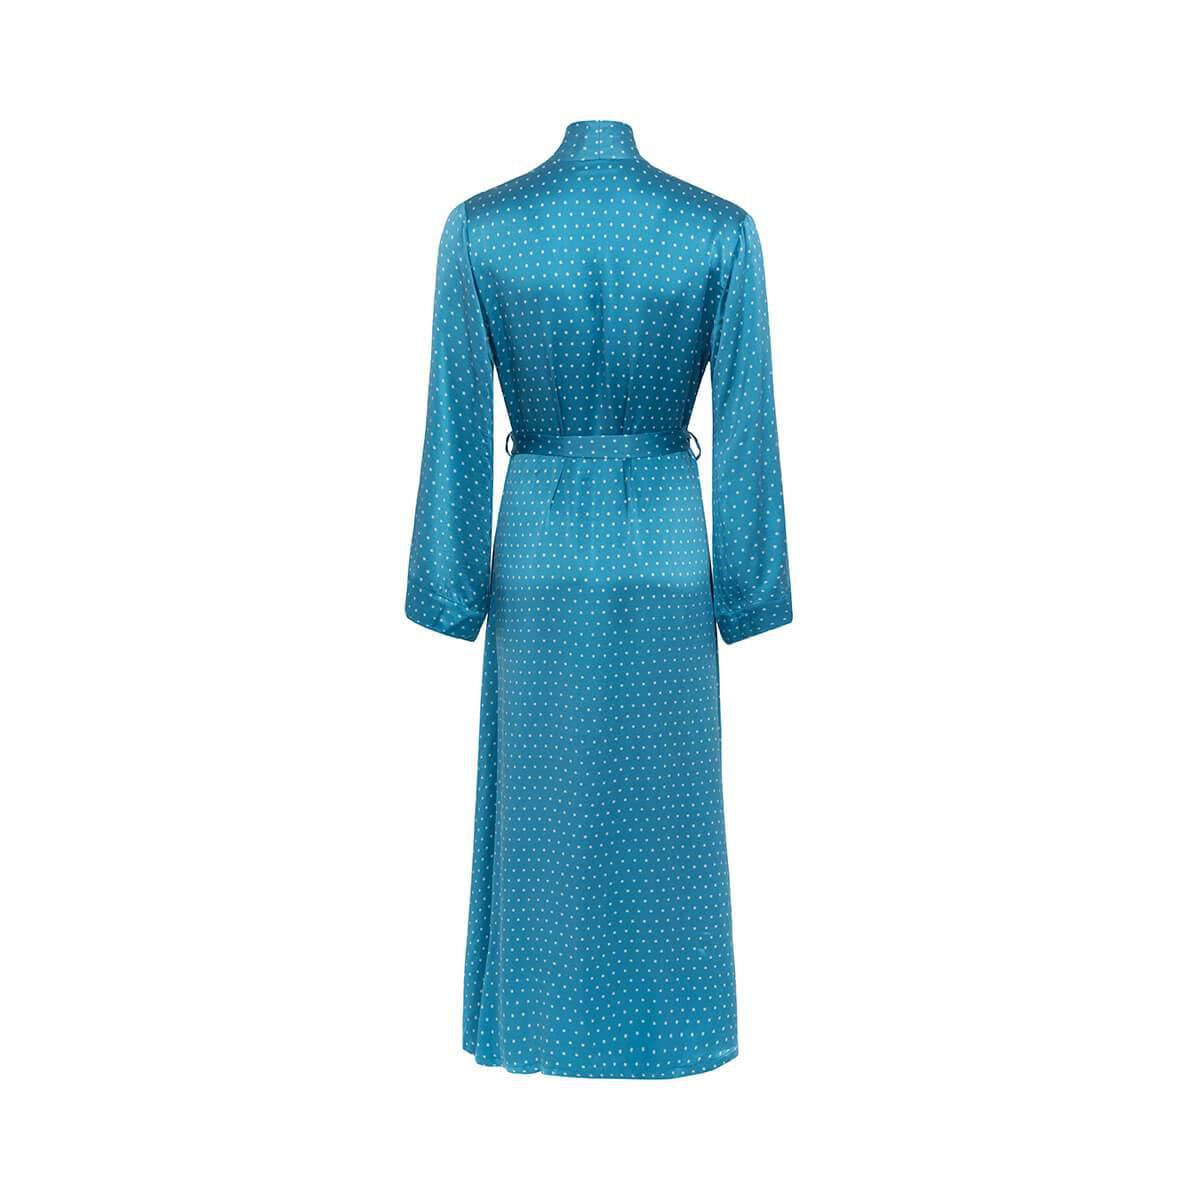 Alice   Astrid Polka Dot Silk Dressing Gown in Blue - Lyst 17f40bbe0